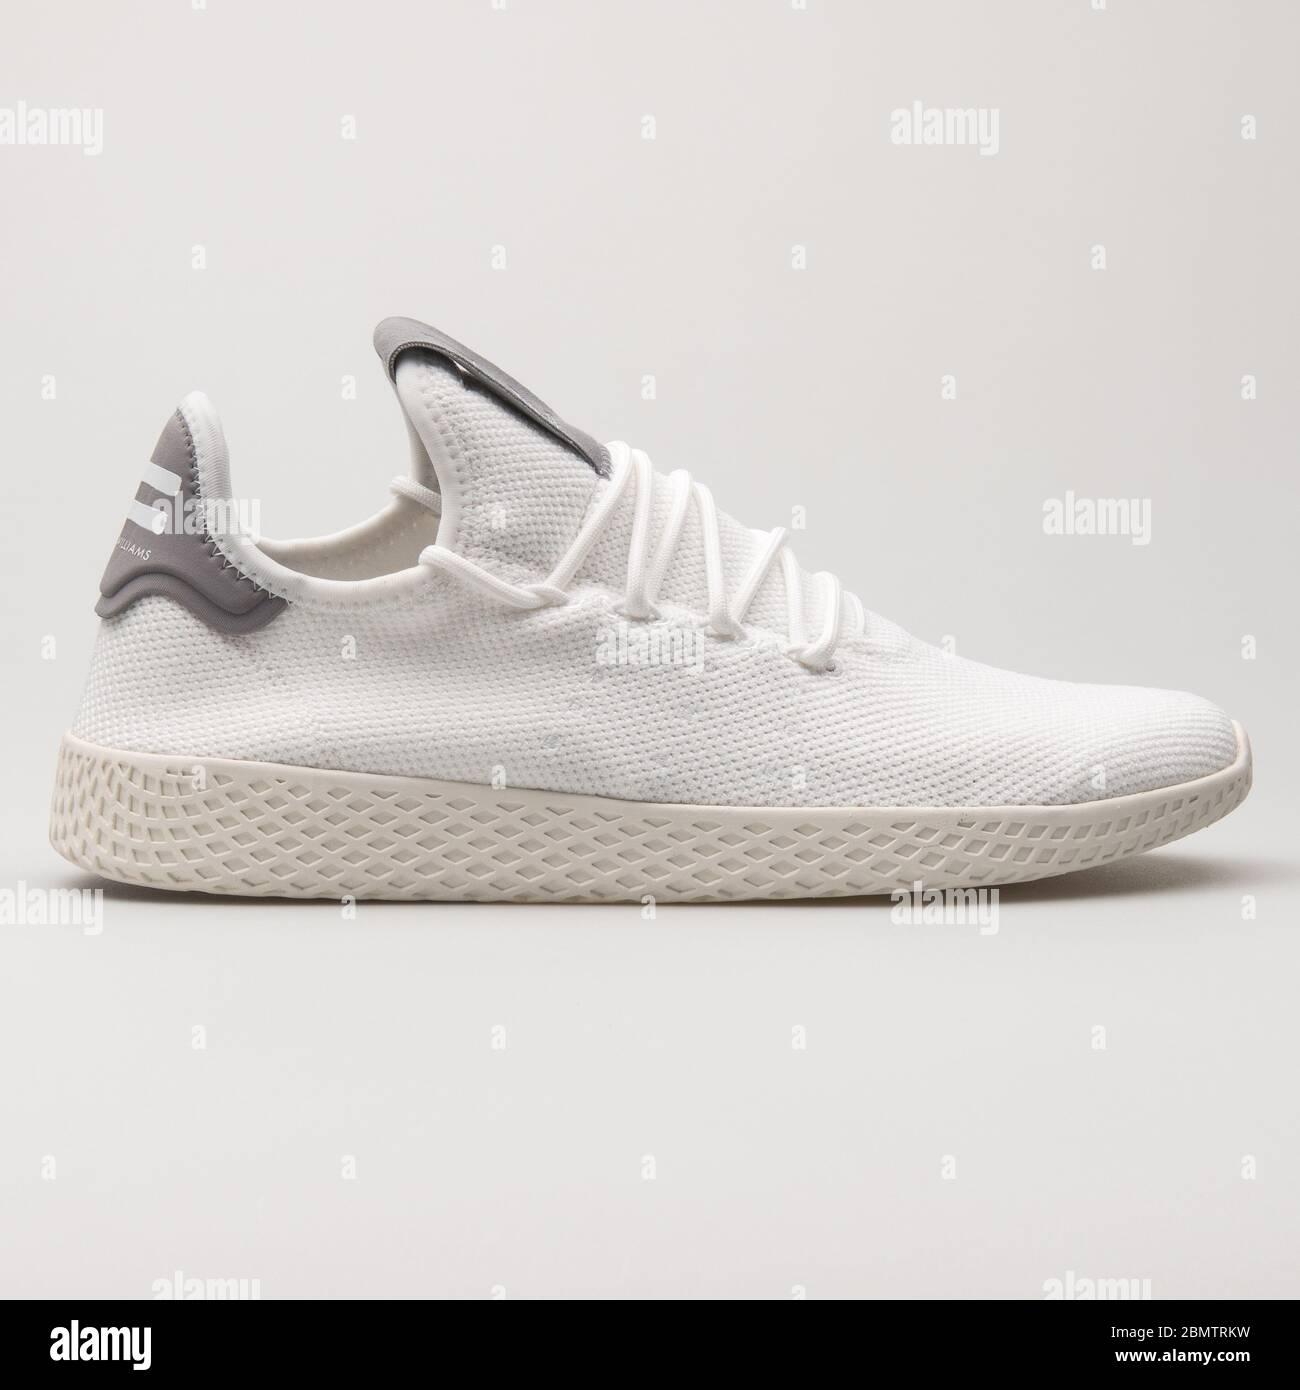 Permanecer Albardilla En general  VIENNA, AUSTRIA - JUNE 14, 2018: Adidas PW Tennis HU white and grey sneaker  on white background Stock Photo - Alamy